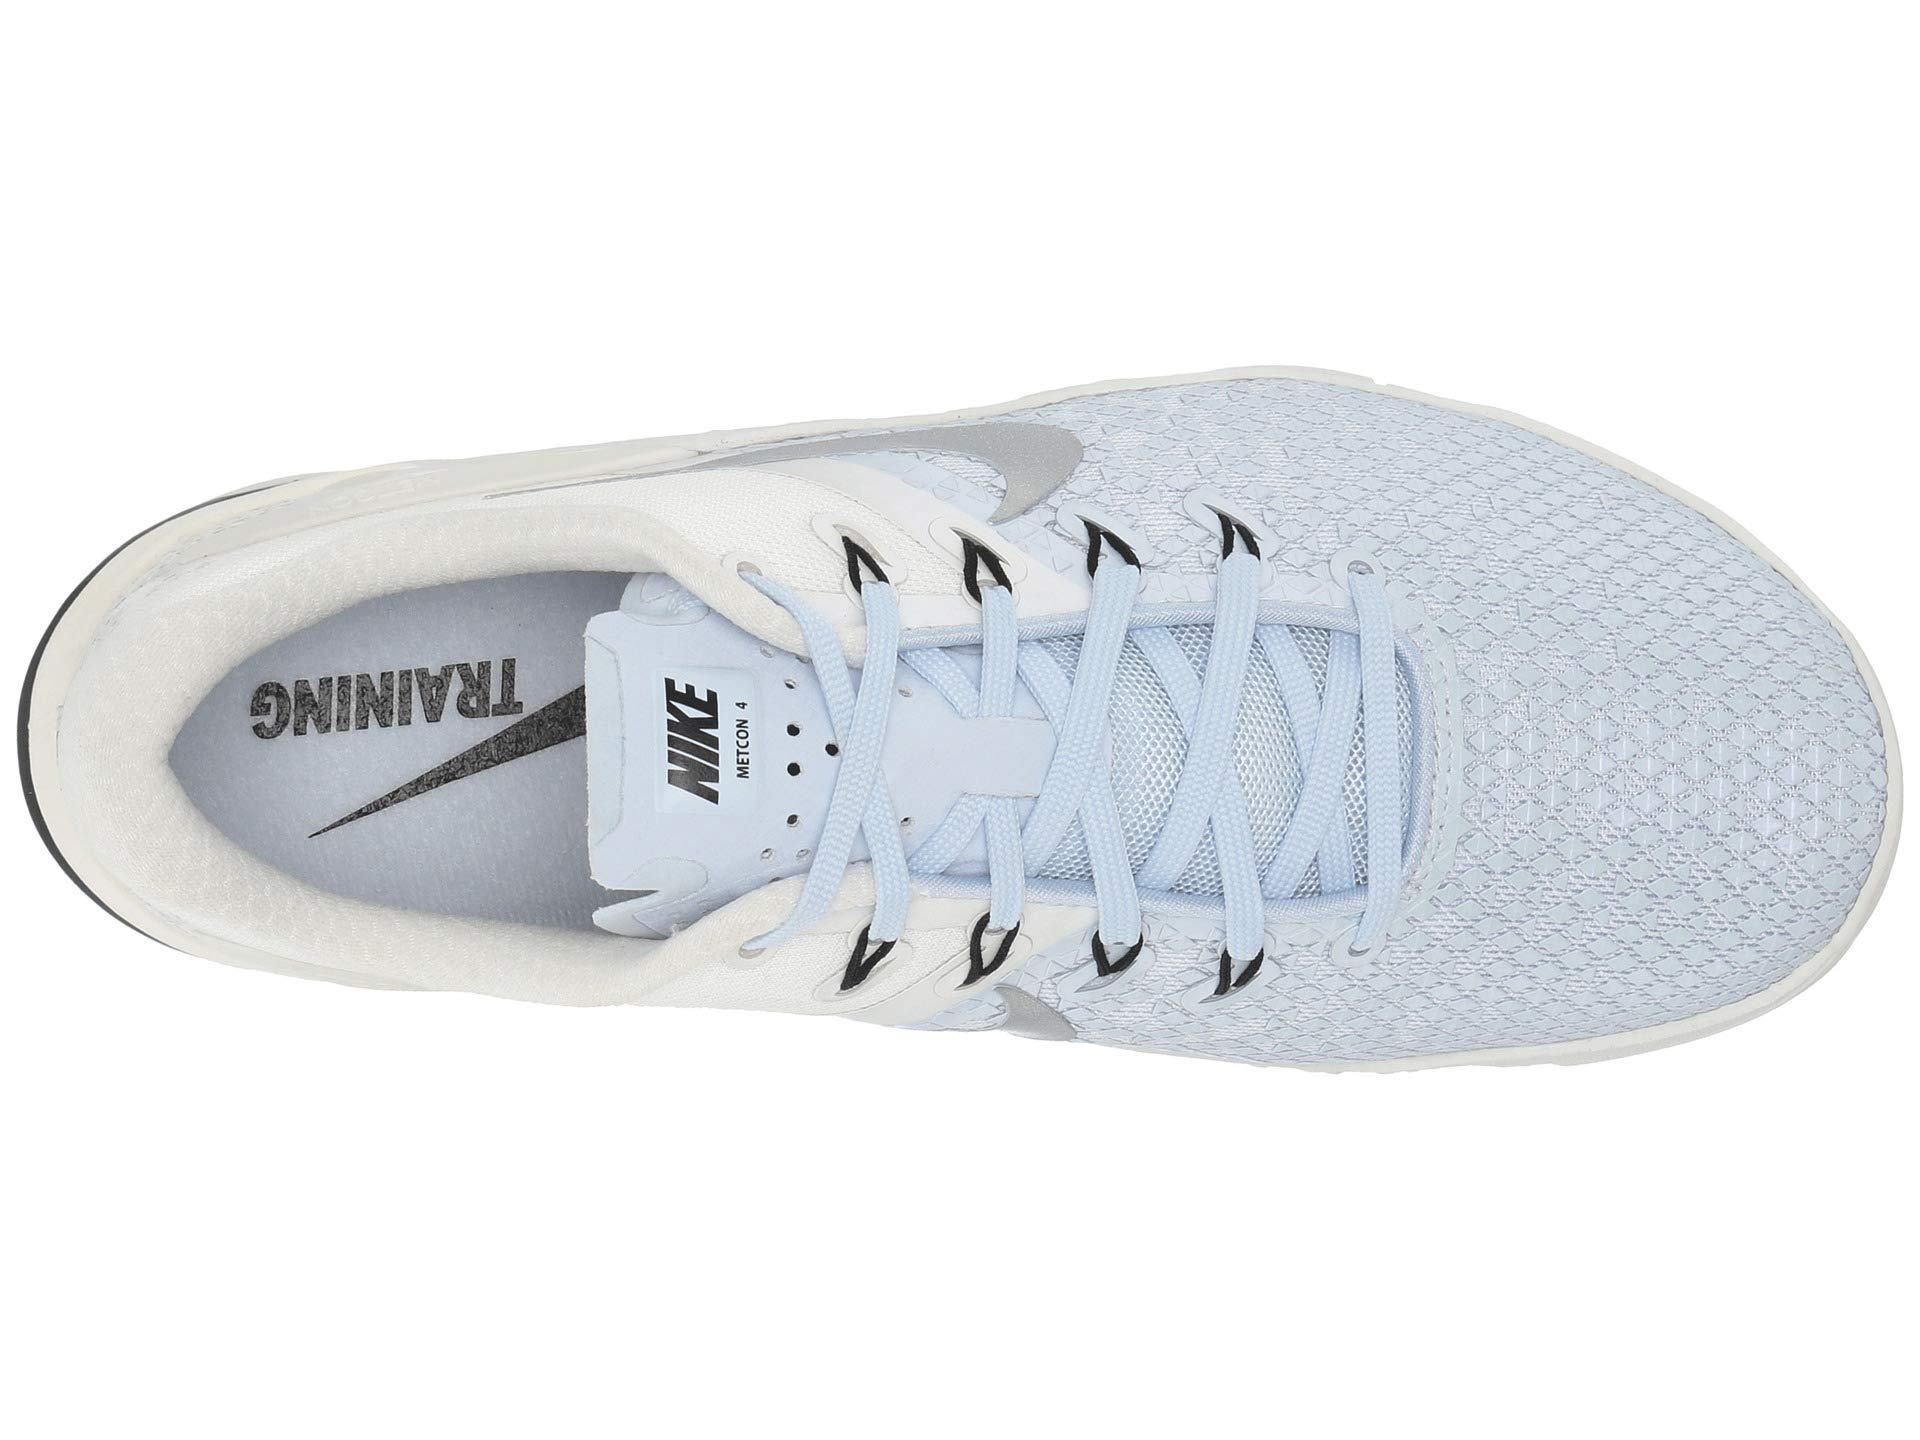 Lyst - Nike Metcon 4 Xd Metallic (half Blue metallic Silver sail ... 8a9ddf355